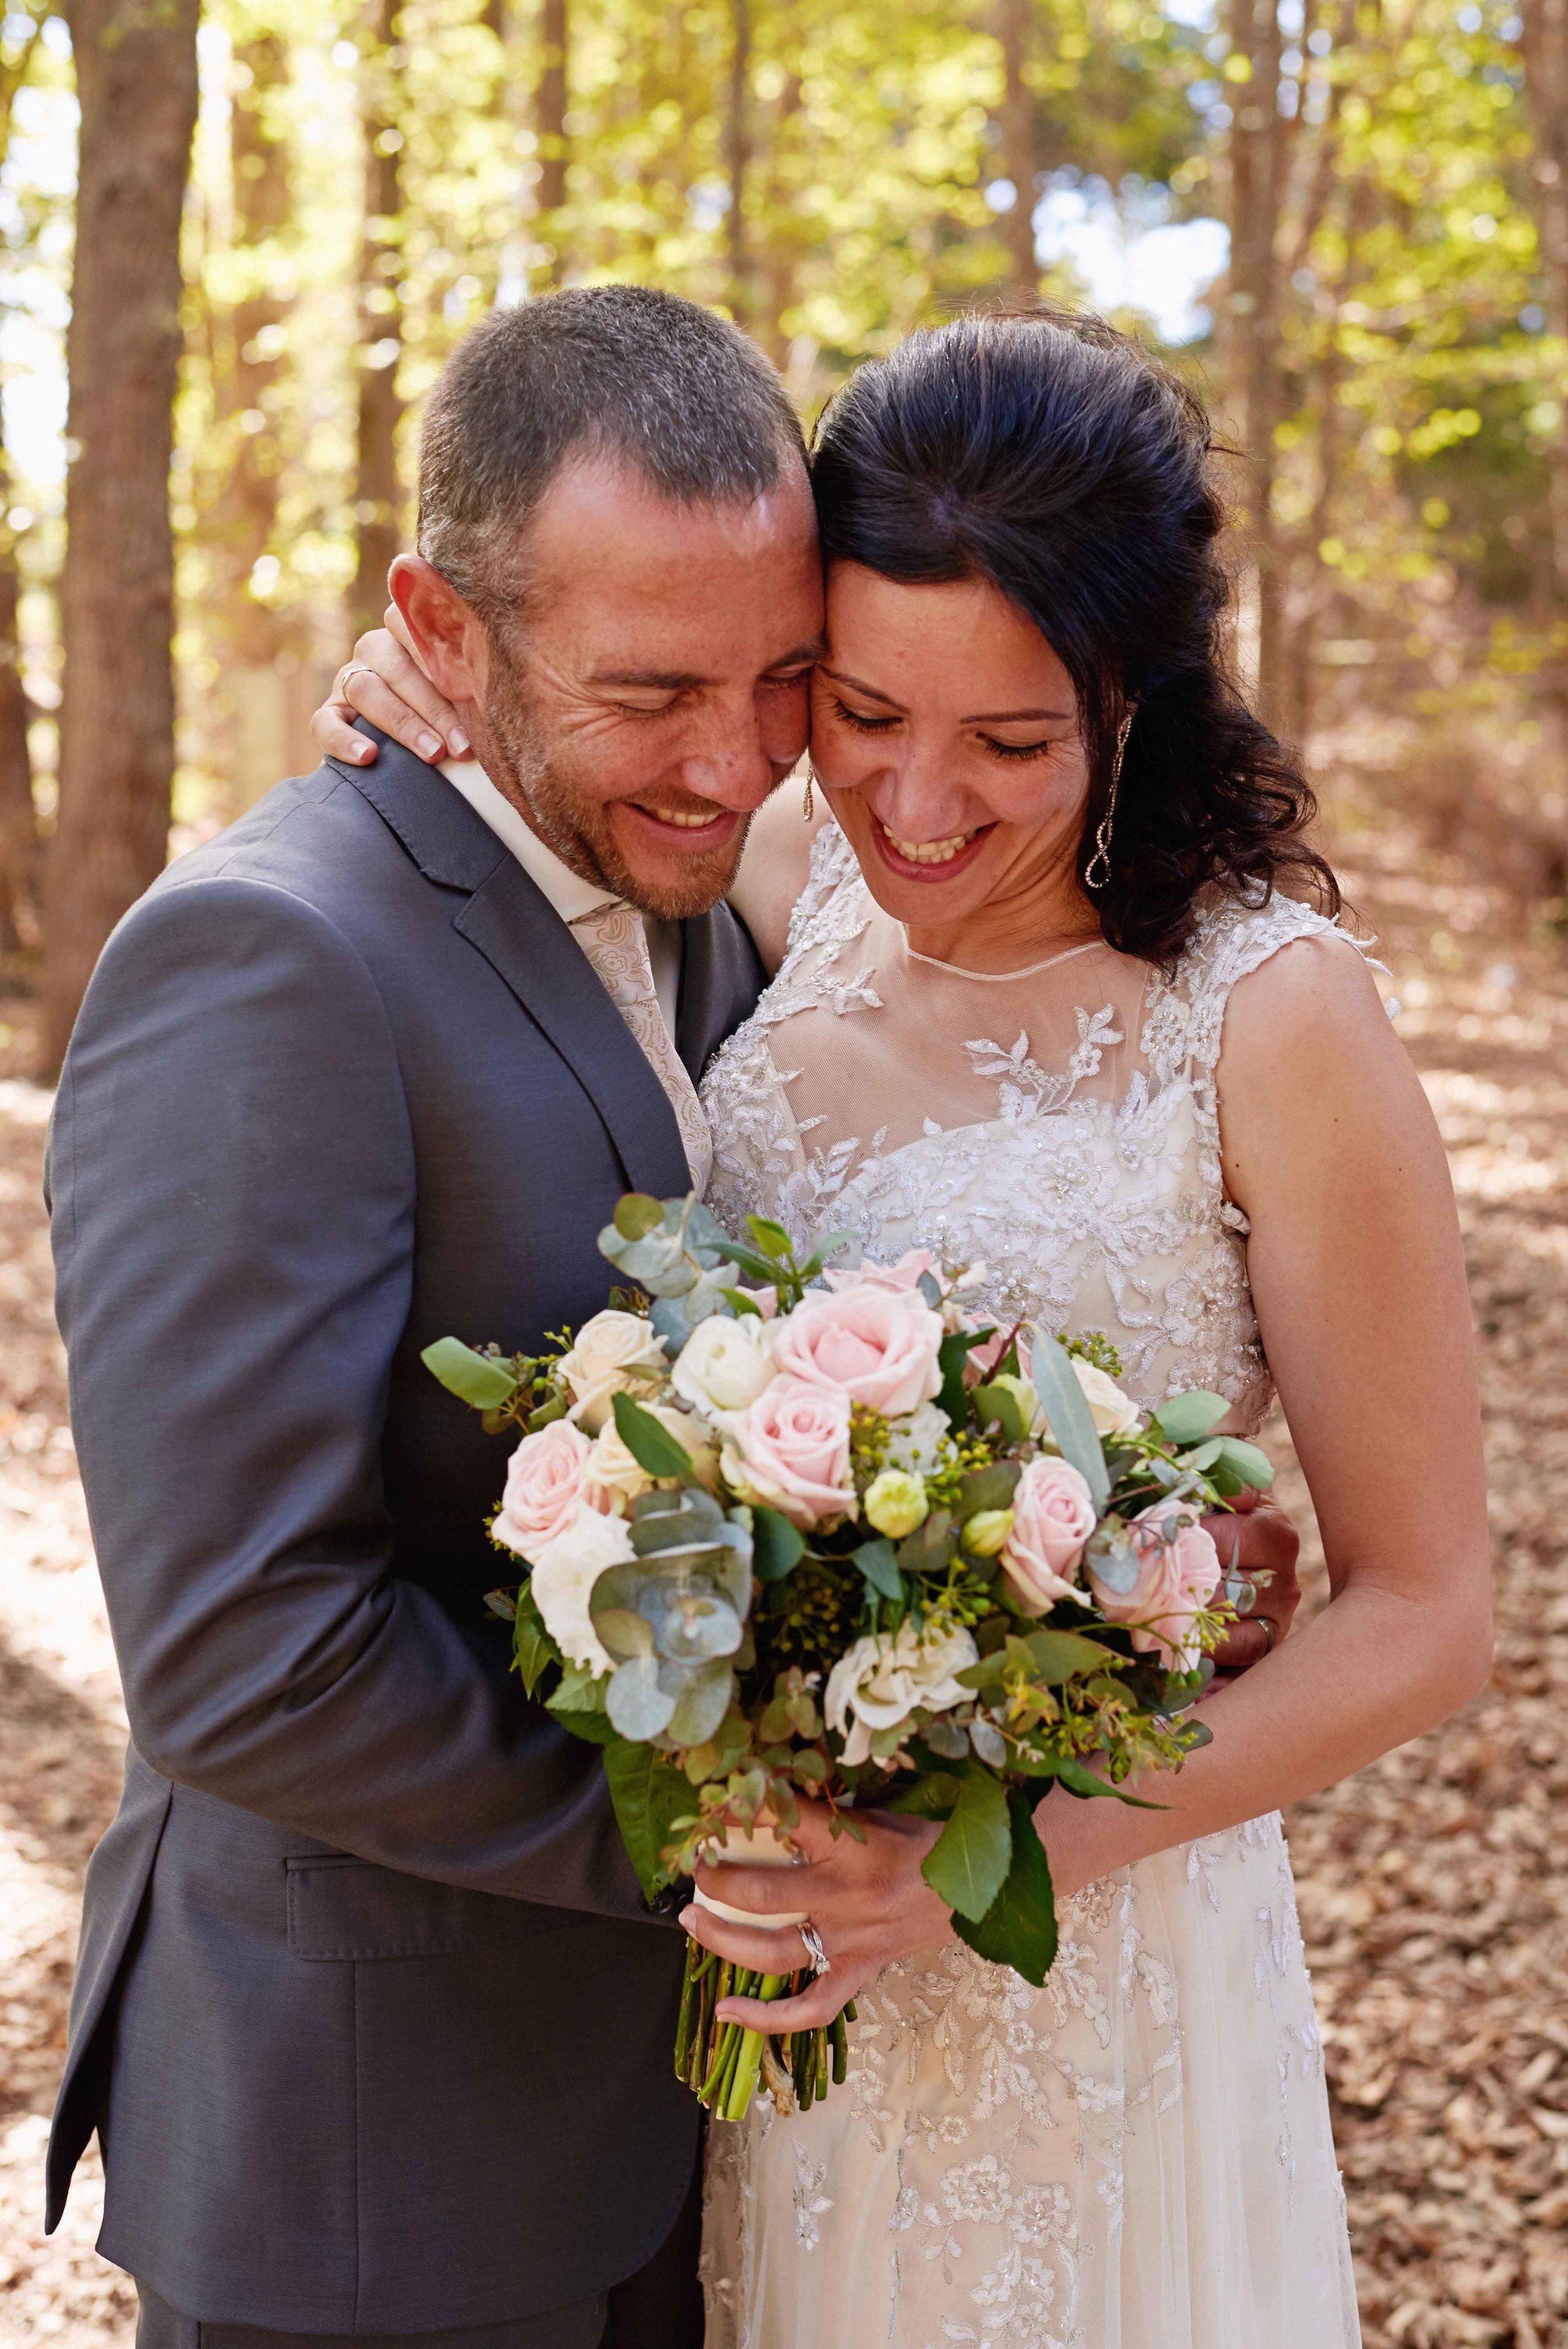 sorrento-wedding-photography-all-smiles-marissa-jade-photography-143.jpg